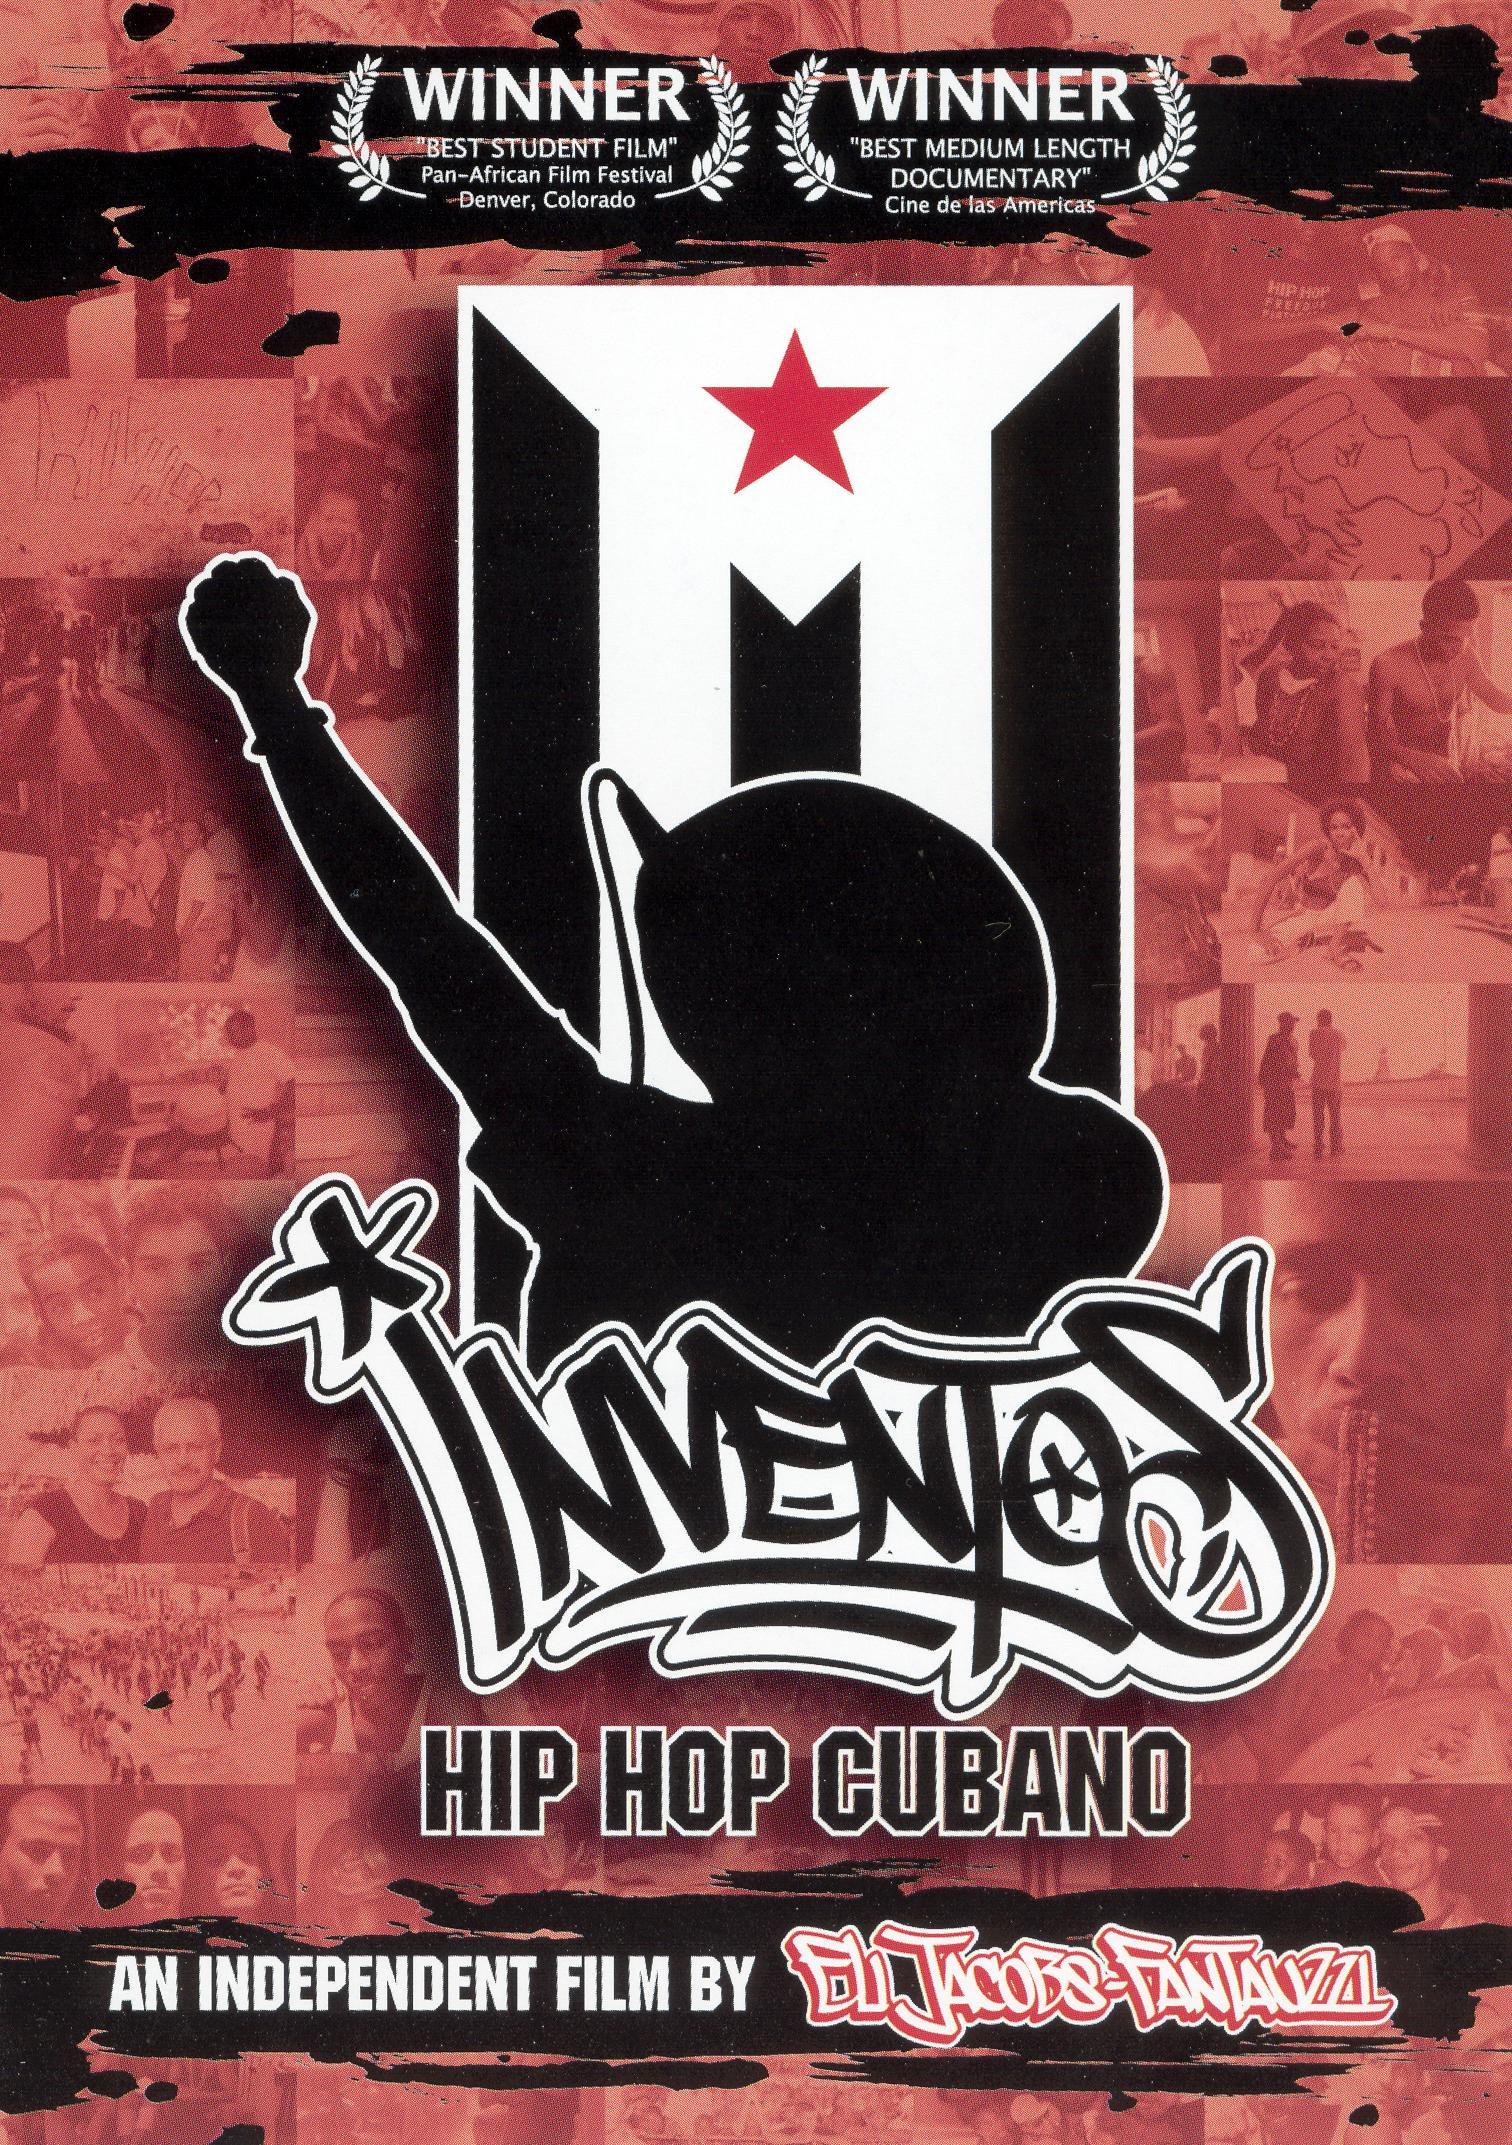 Eli Jacobs Fantauzzi: Inventos: Hip Hop Cubano